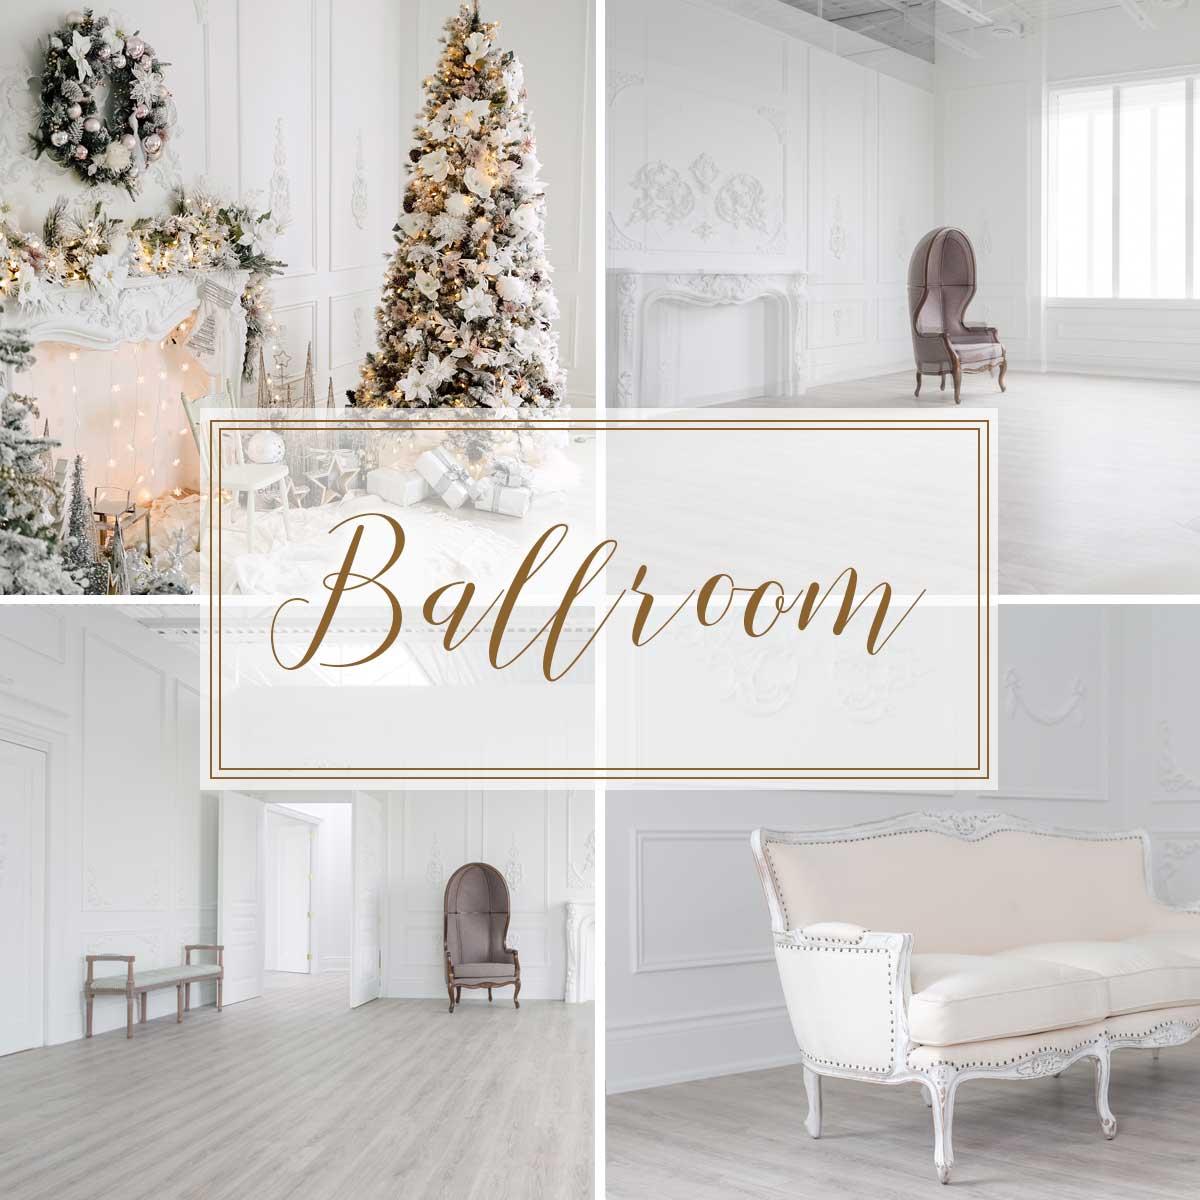 Photography studio ballroom